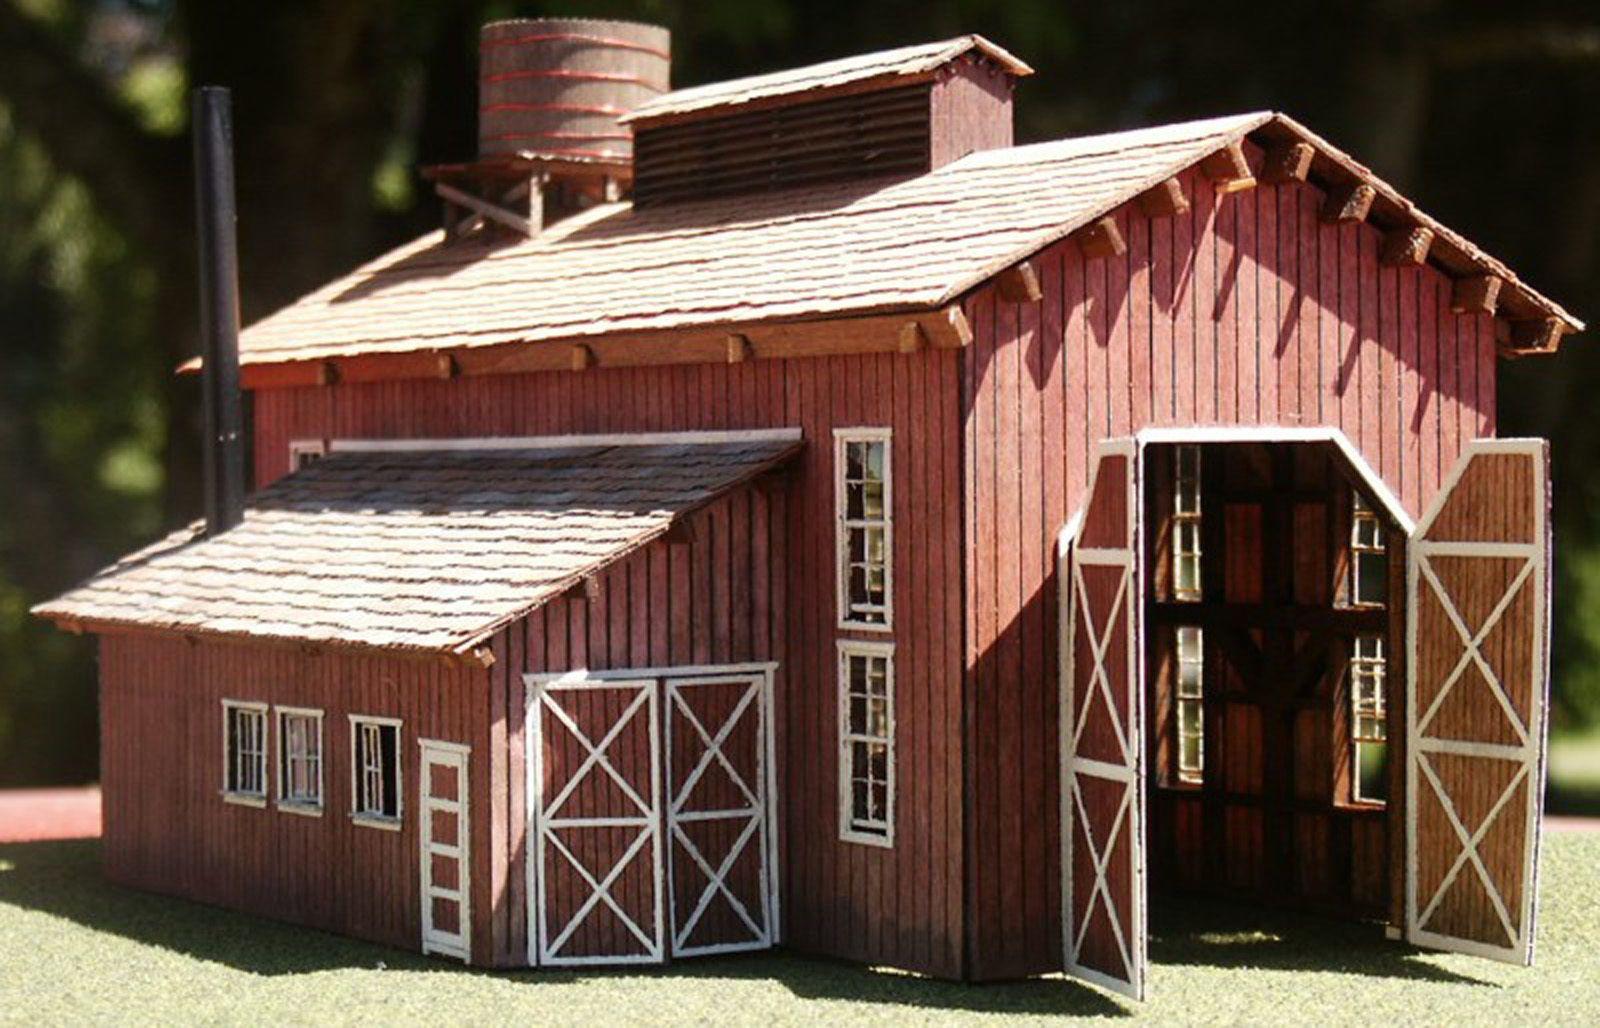 Single Stall Enginehouse Ho Hon3 Model Railroad Structure Wood Laser Kit Rsl2003